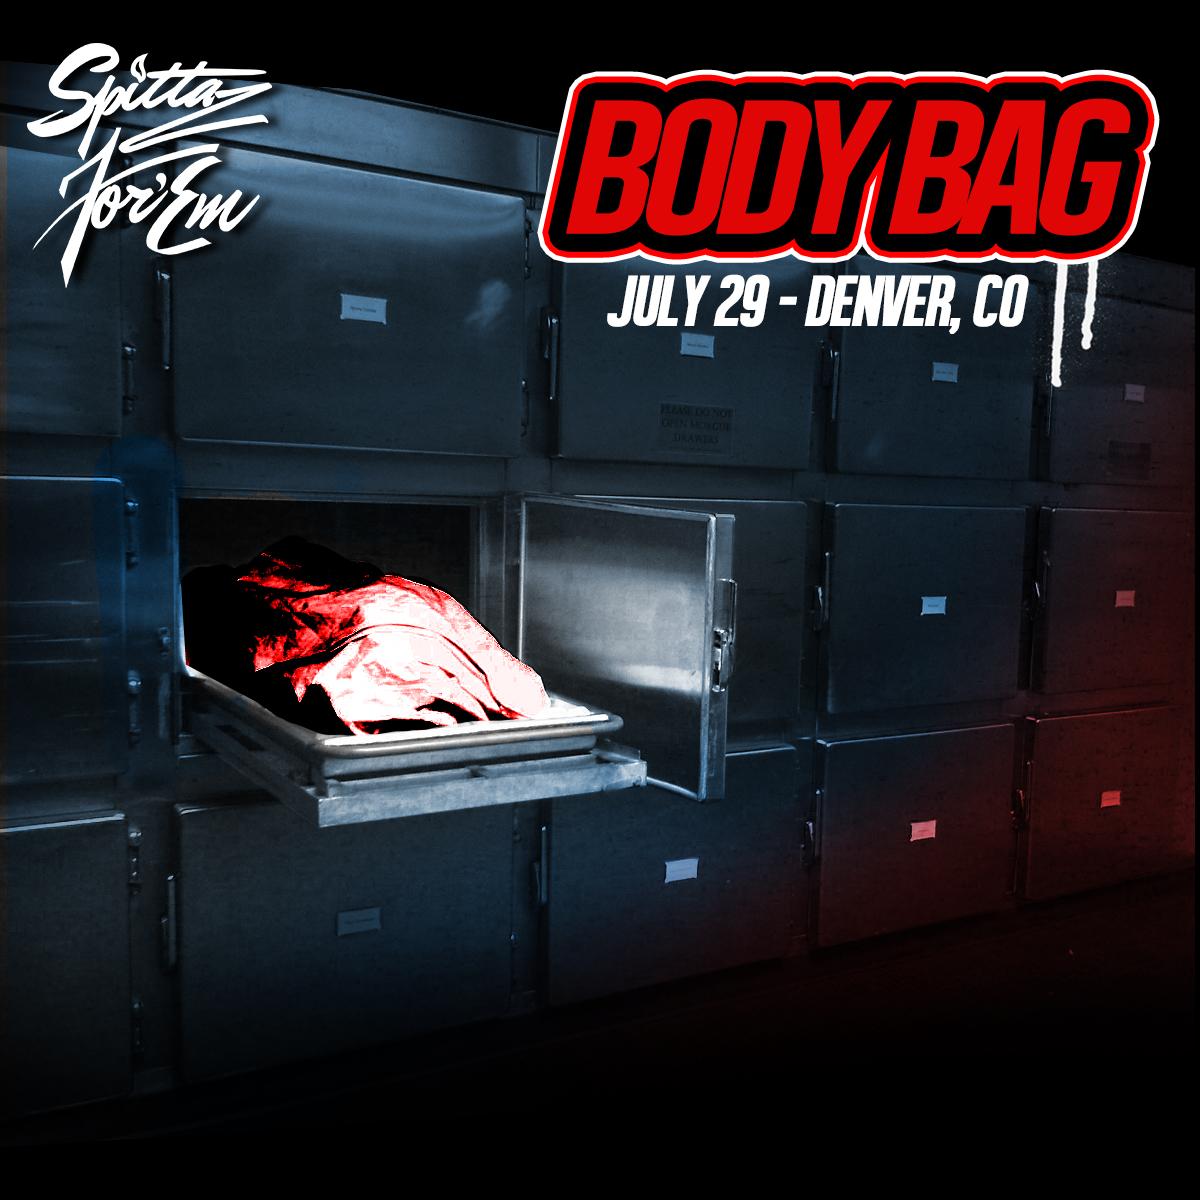 FB-Body-Bag-flyer.jpg